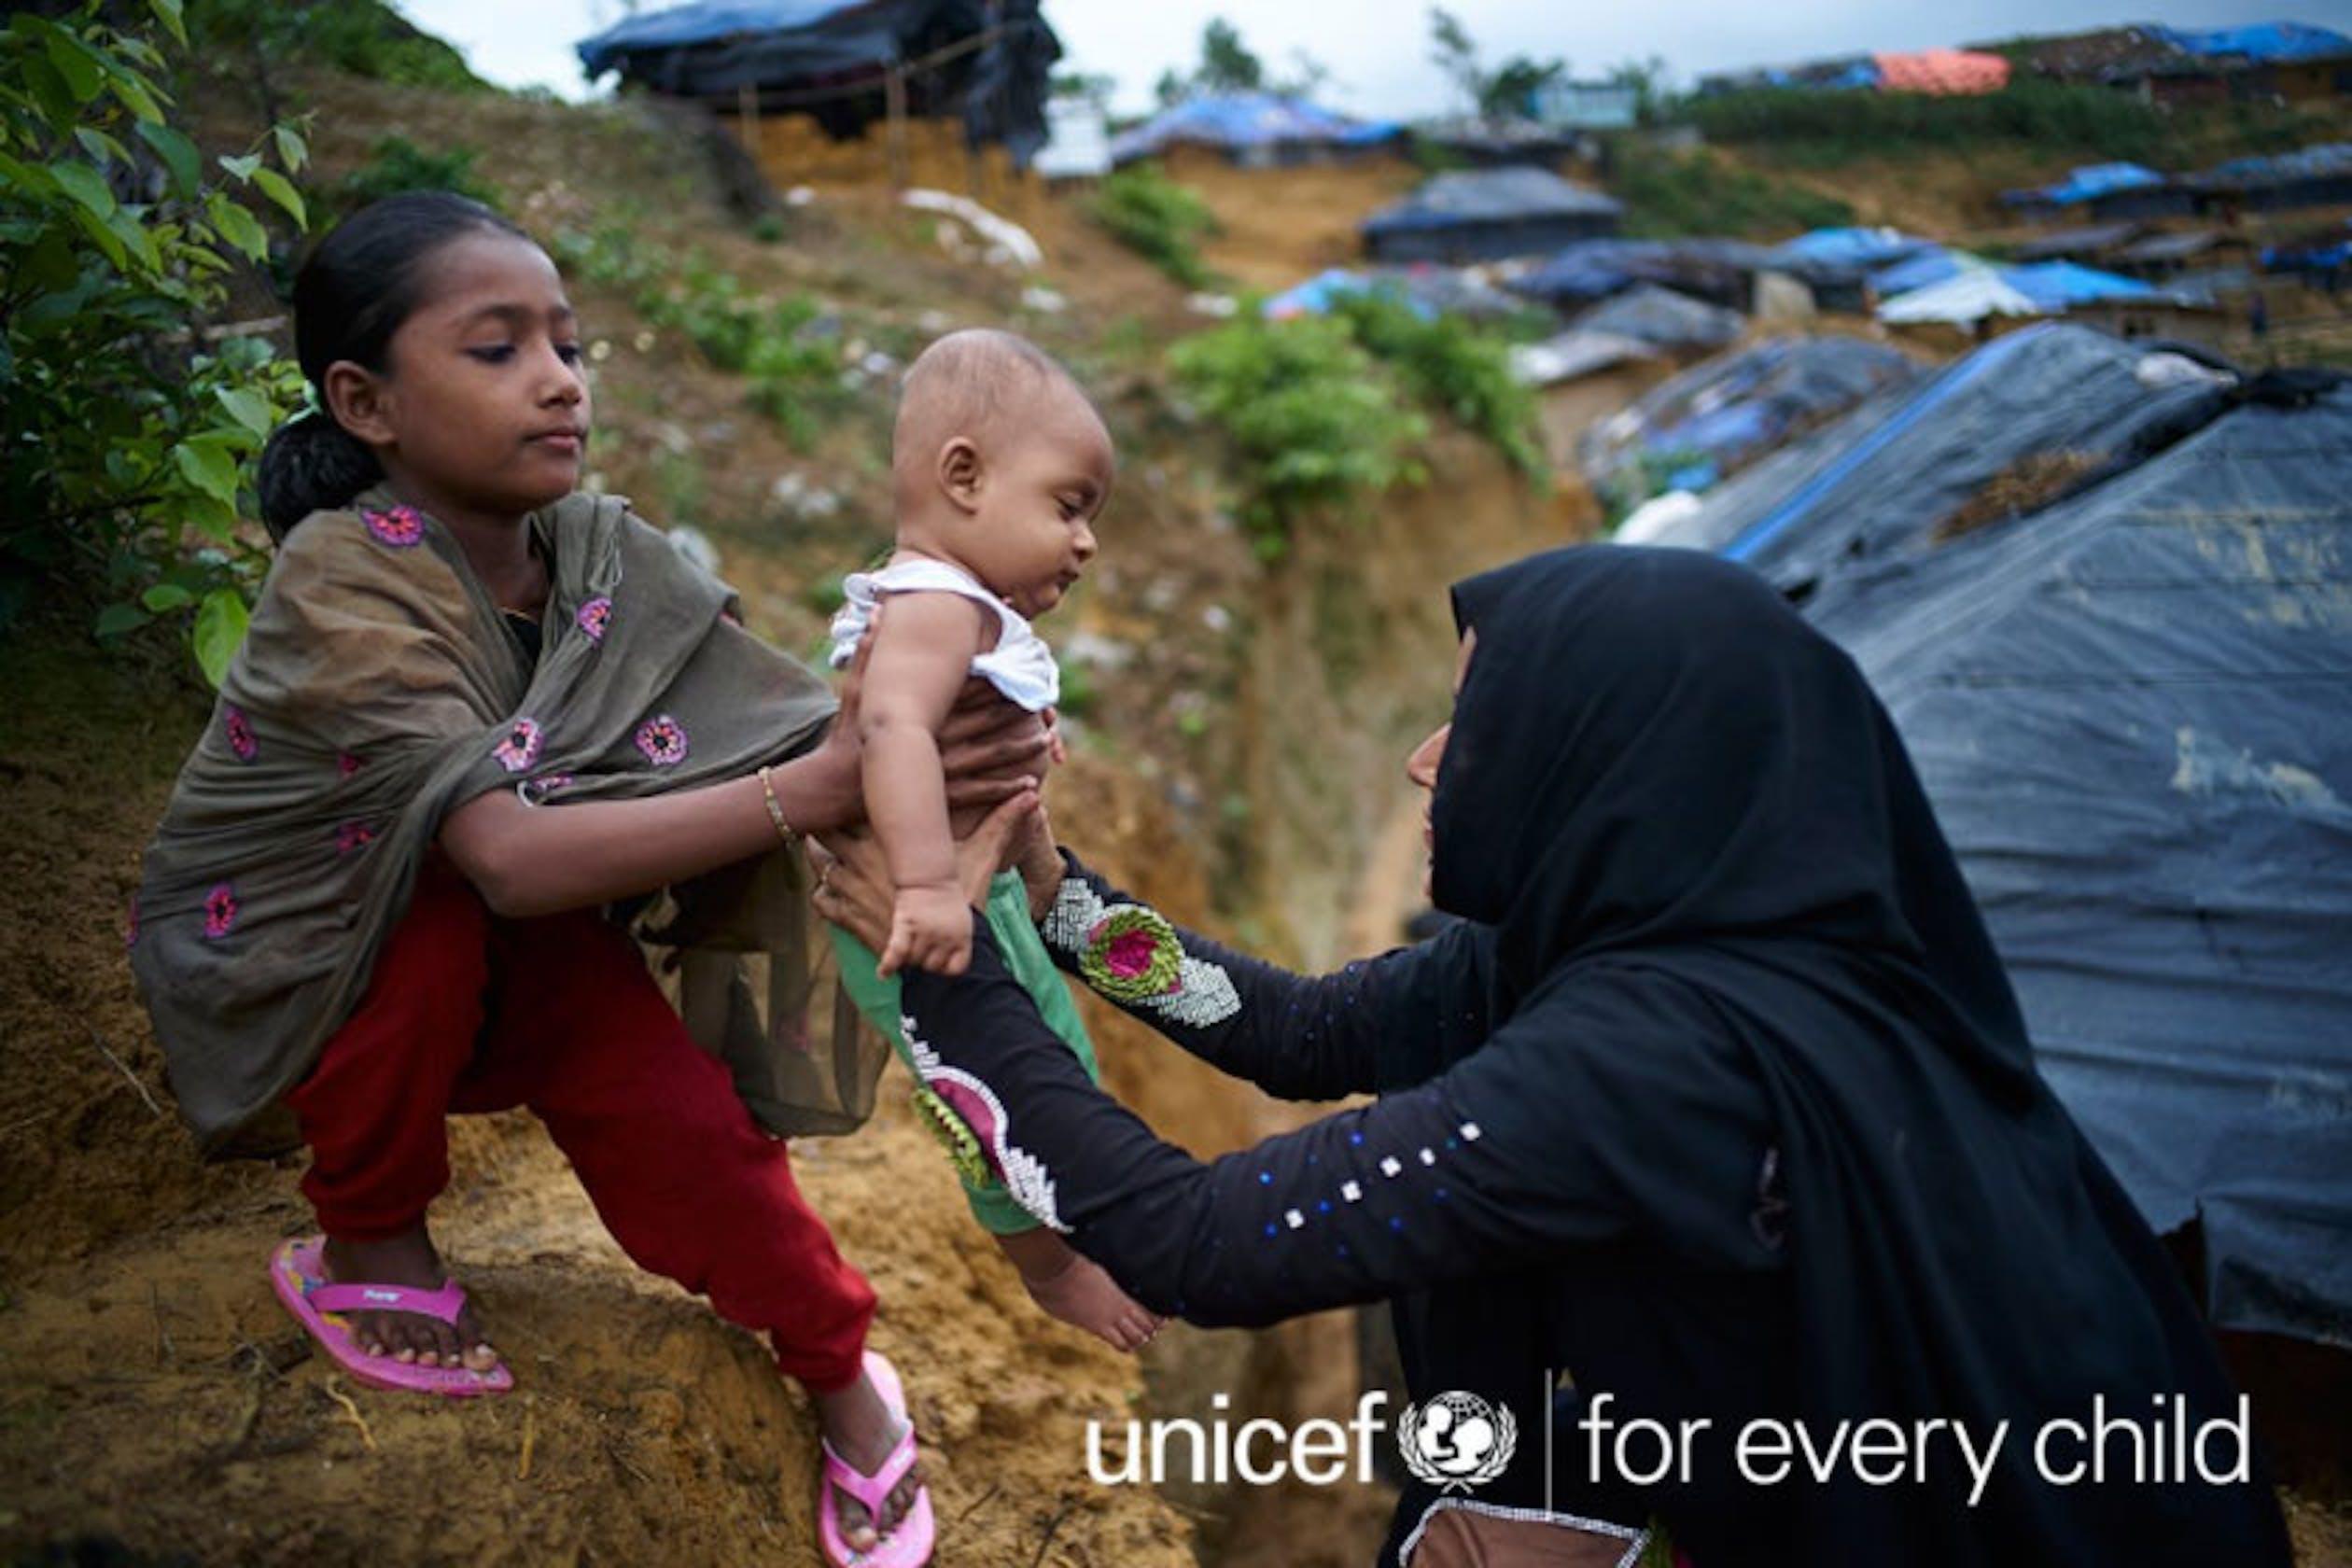 Una famiglia Rohingya rifugiata in Bangladesh dalle persecuzioni nel vicino Myanmar - ©UNICEF Bangladesh/2017